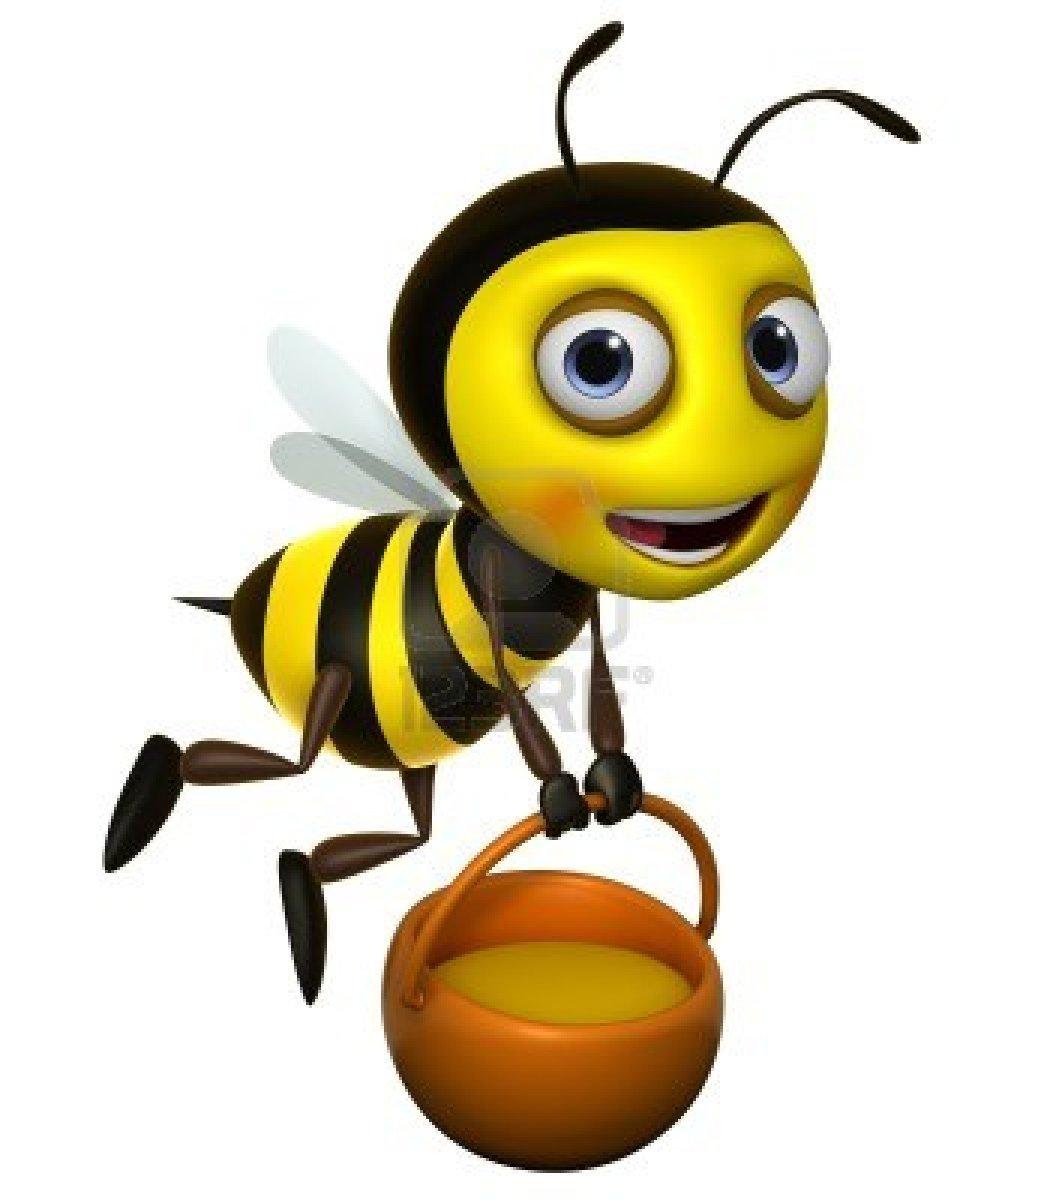 Cute Honey Bee Clipart Clipart .-Cute Honey Bee Clipart Clipart .-14